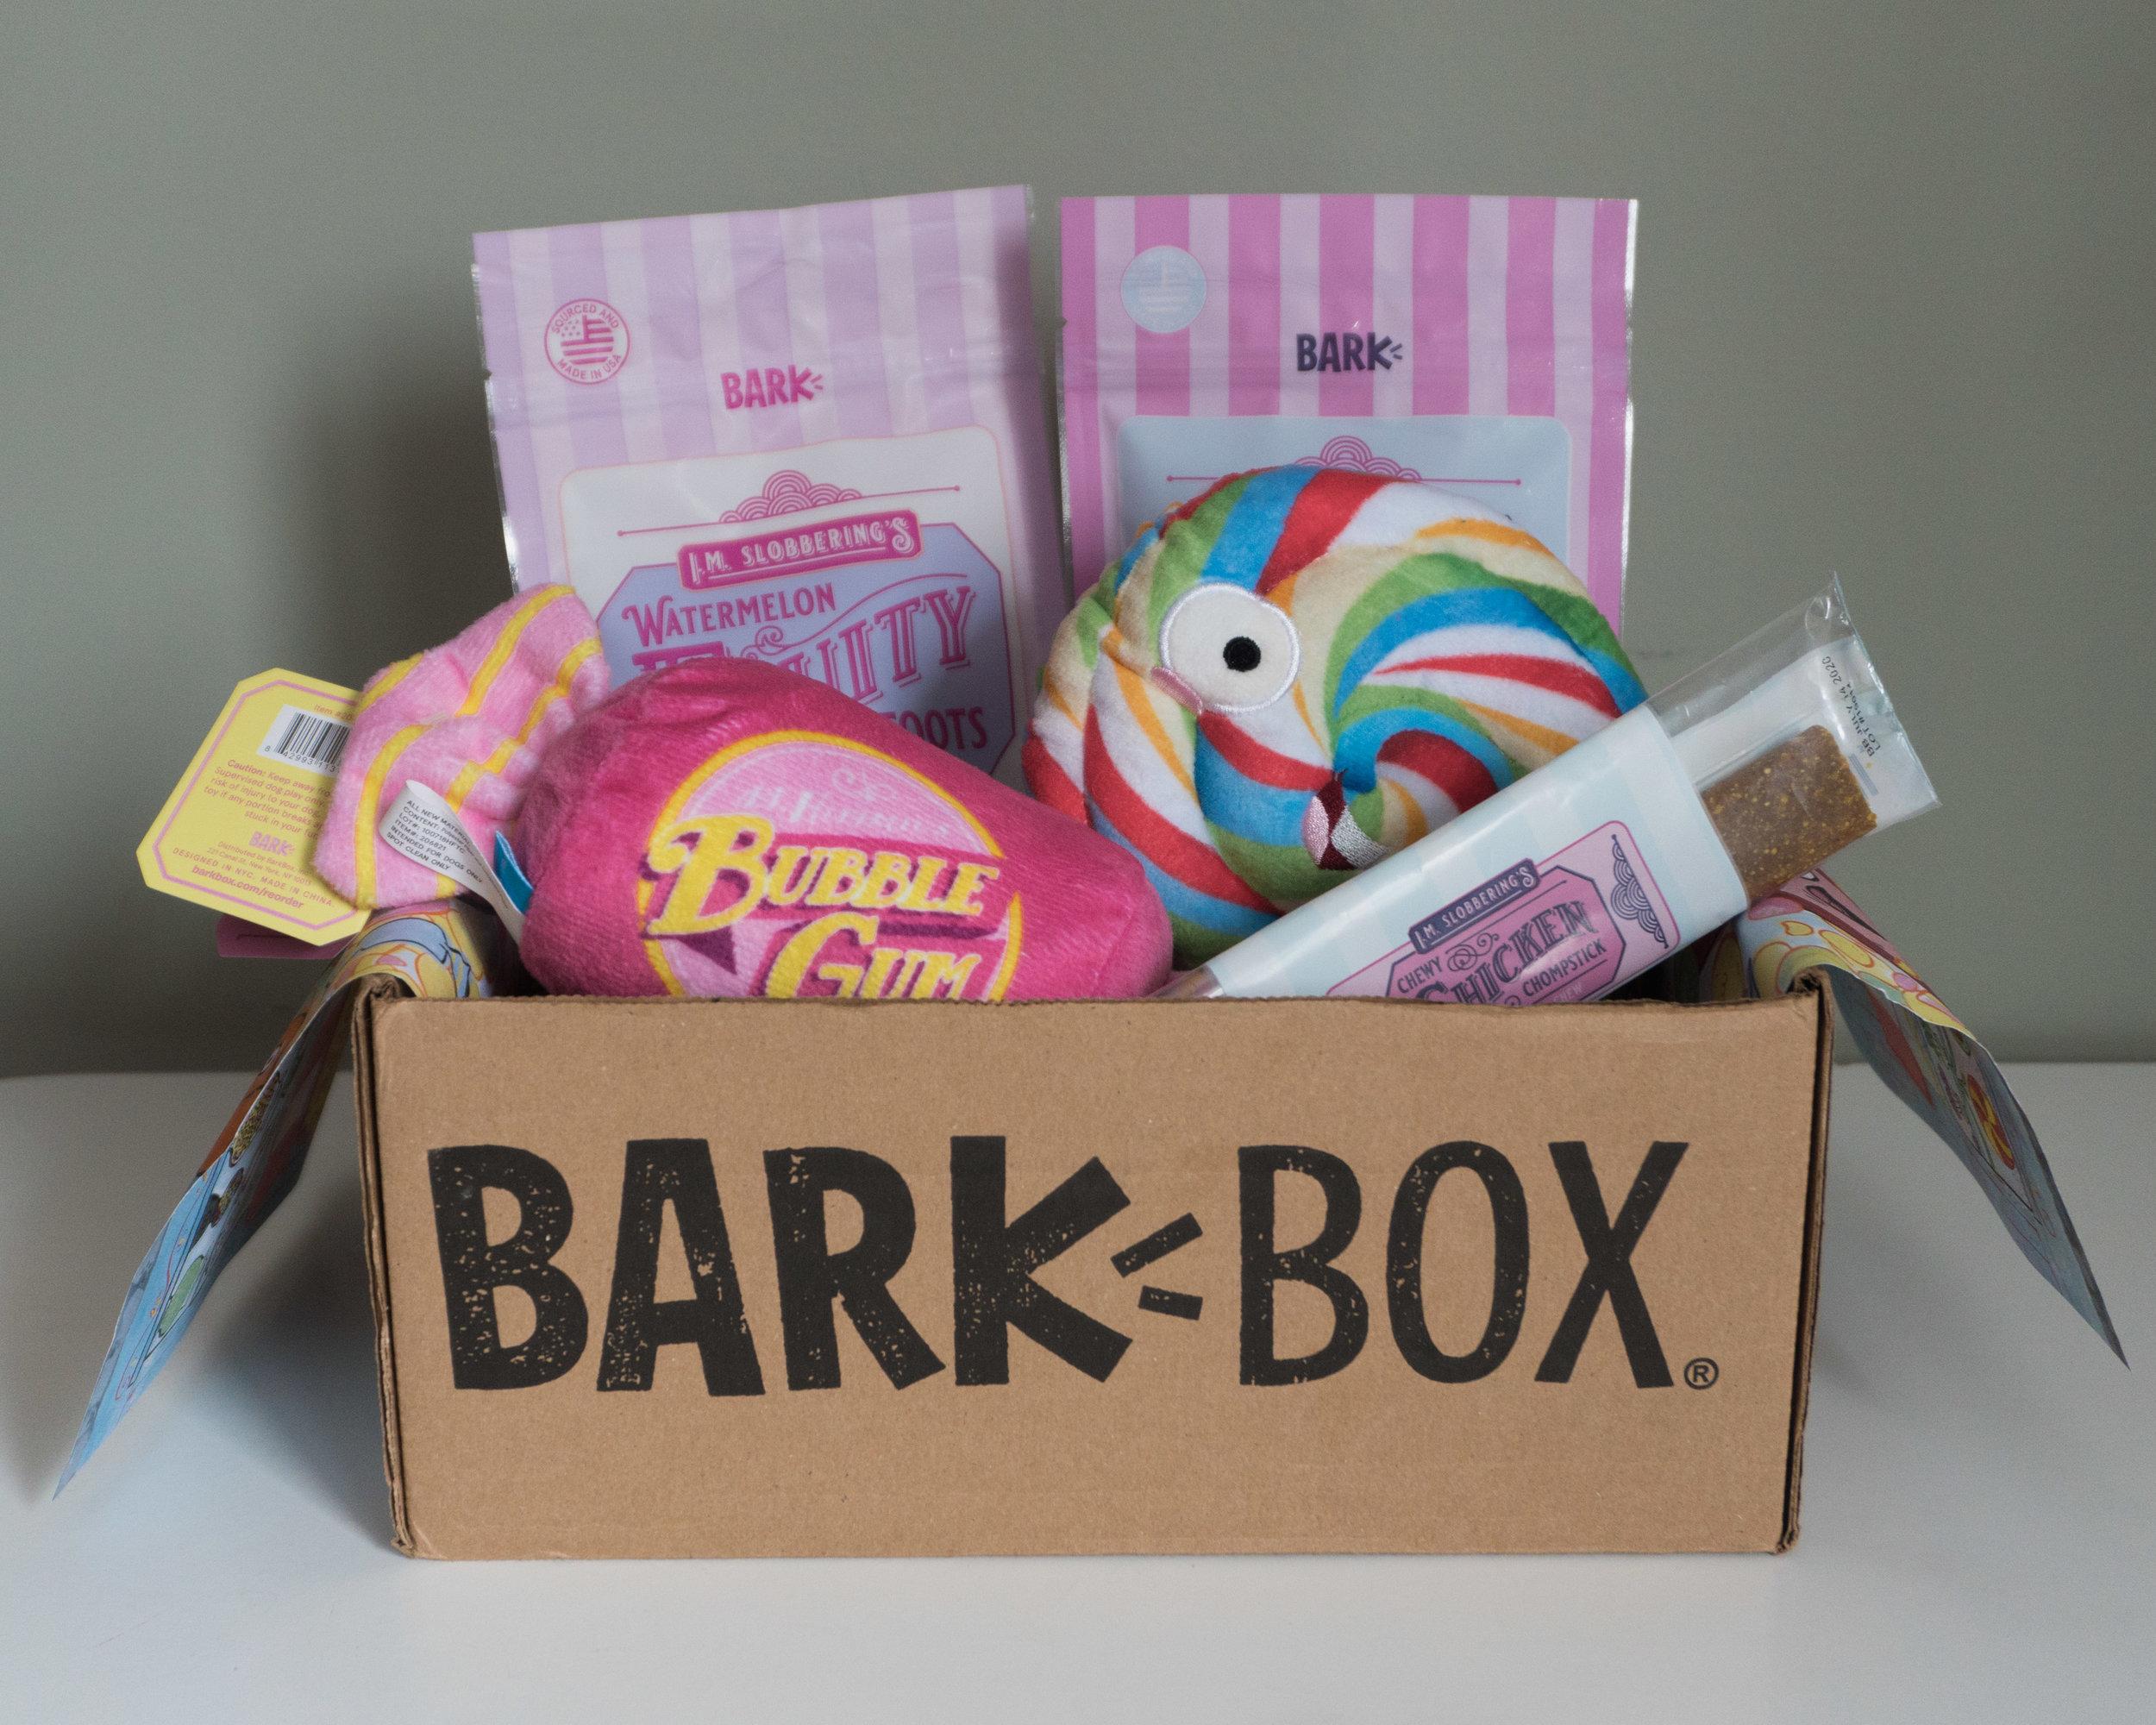 febbarkbox2019 (1 of 7).jpg